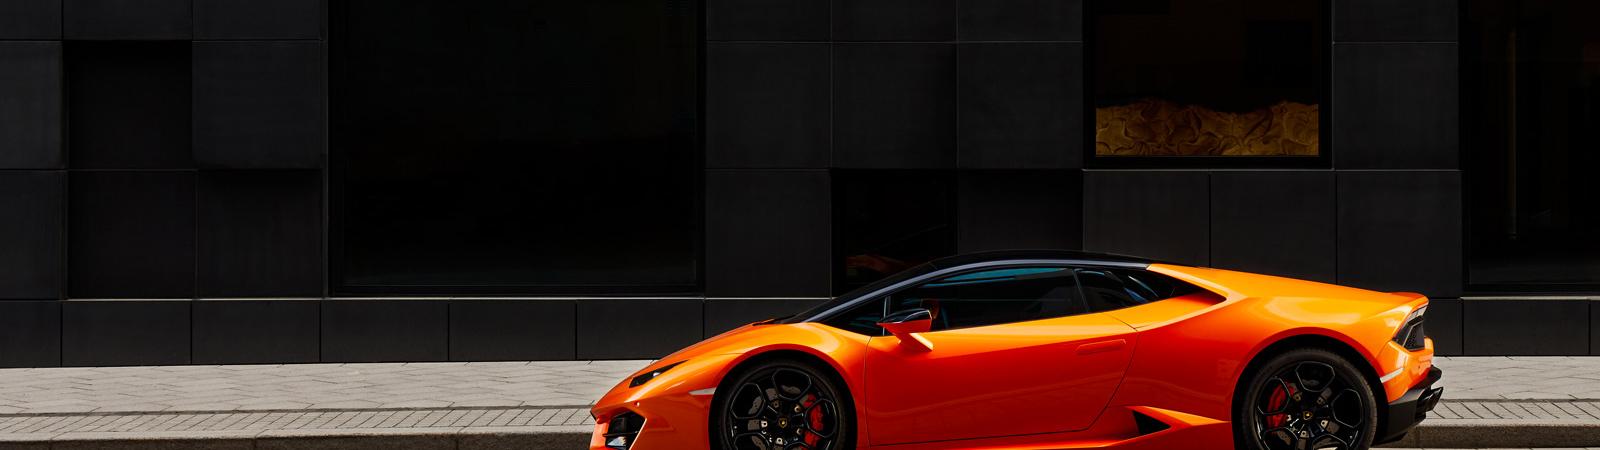 Lamborghini Automotive and Transportation Industry Testing